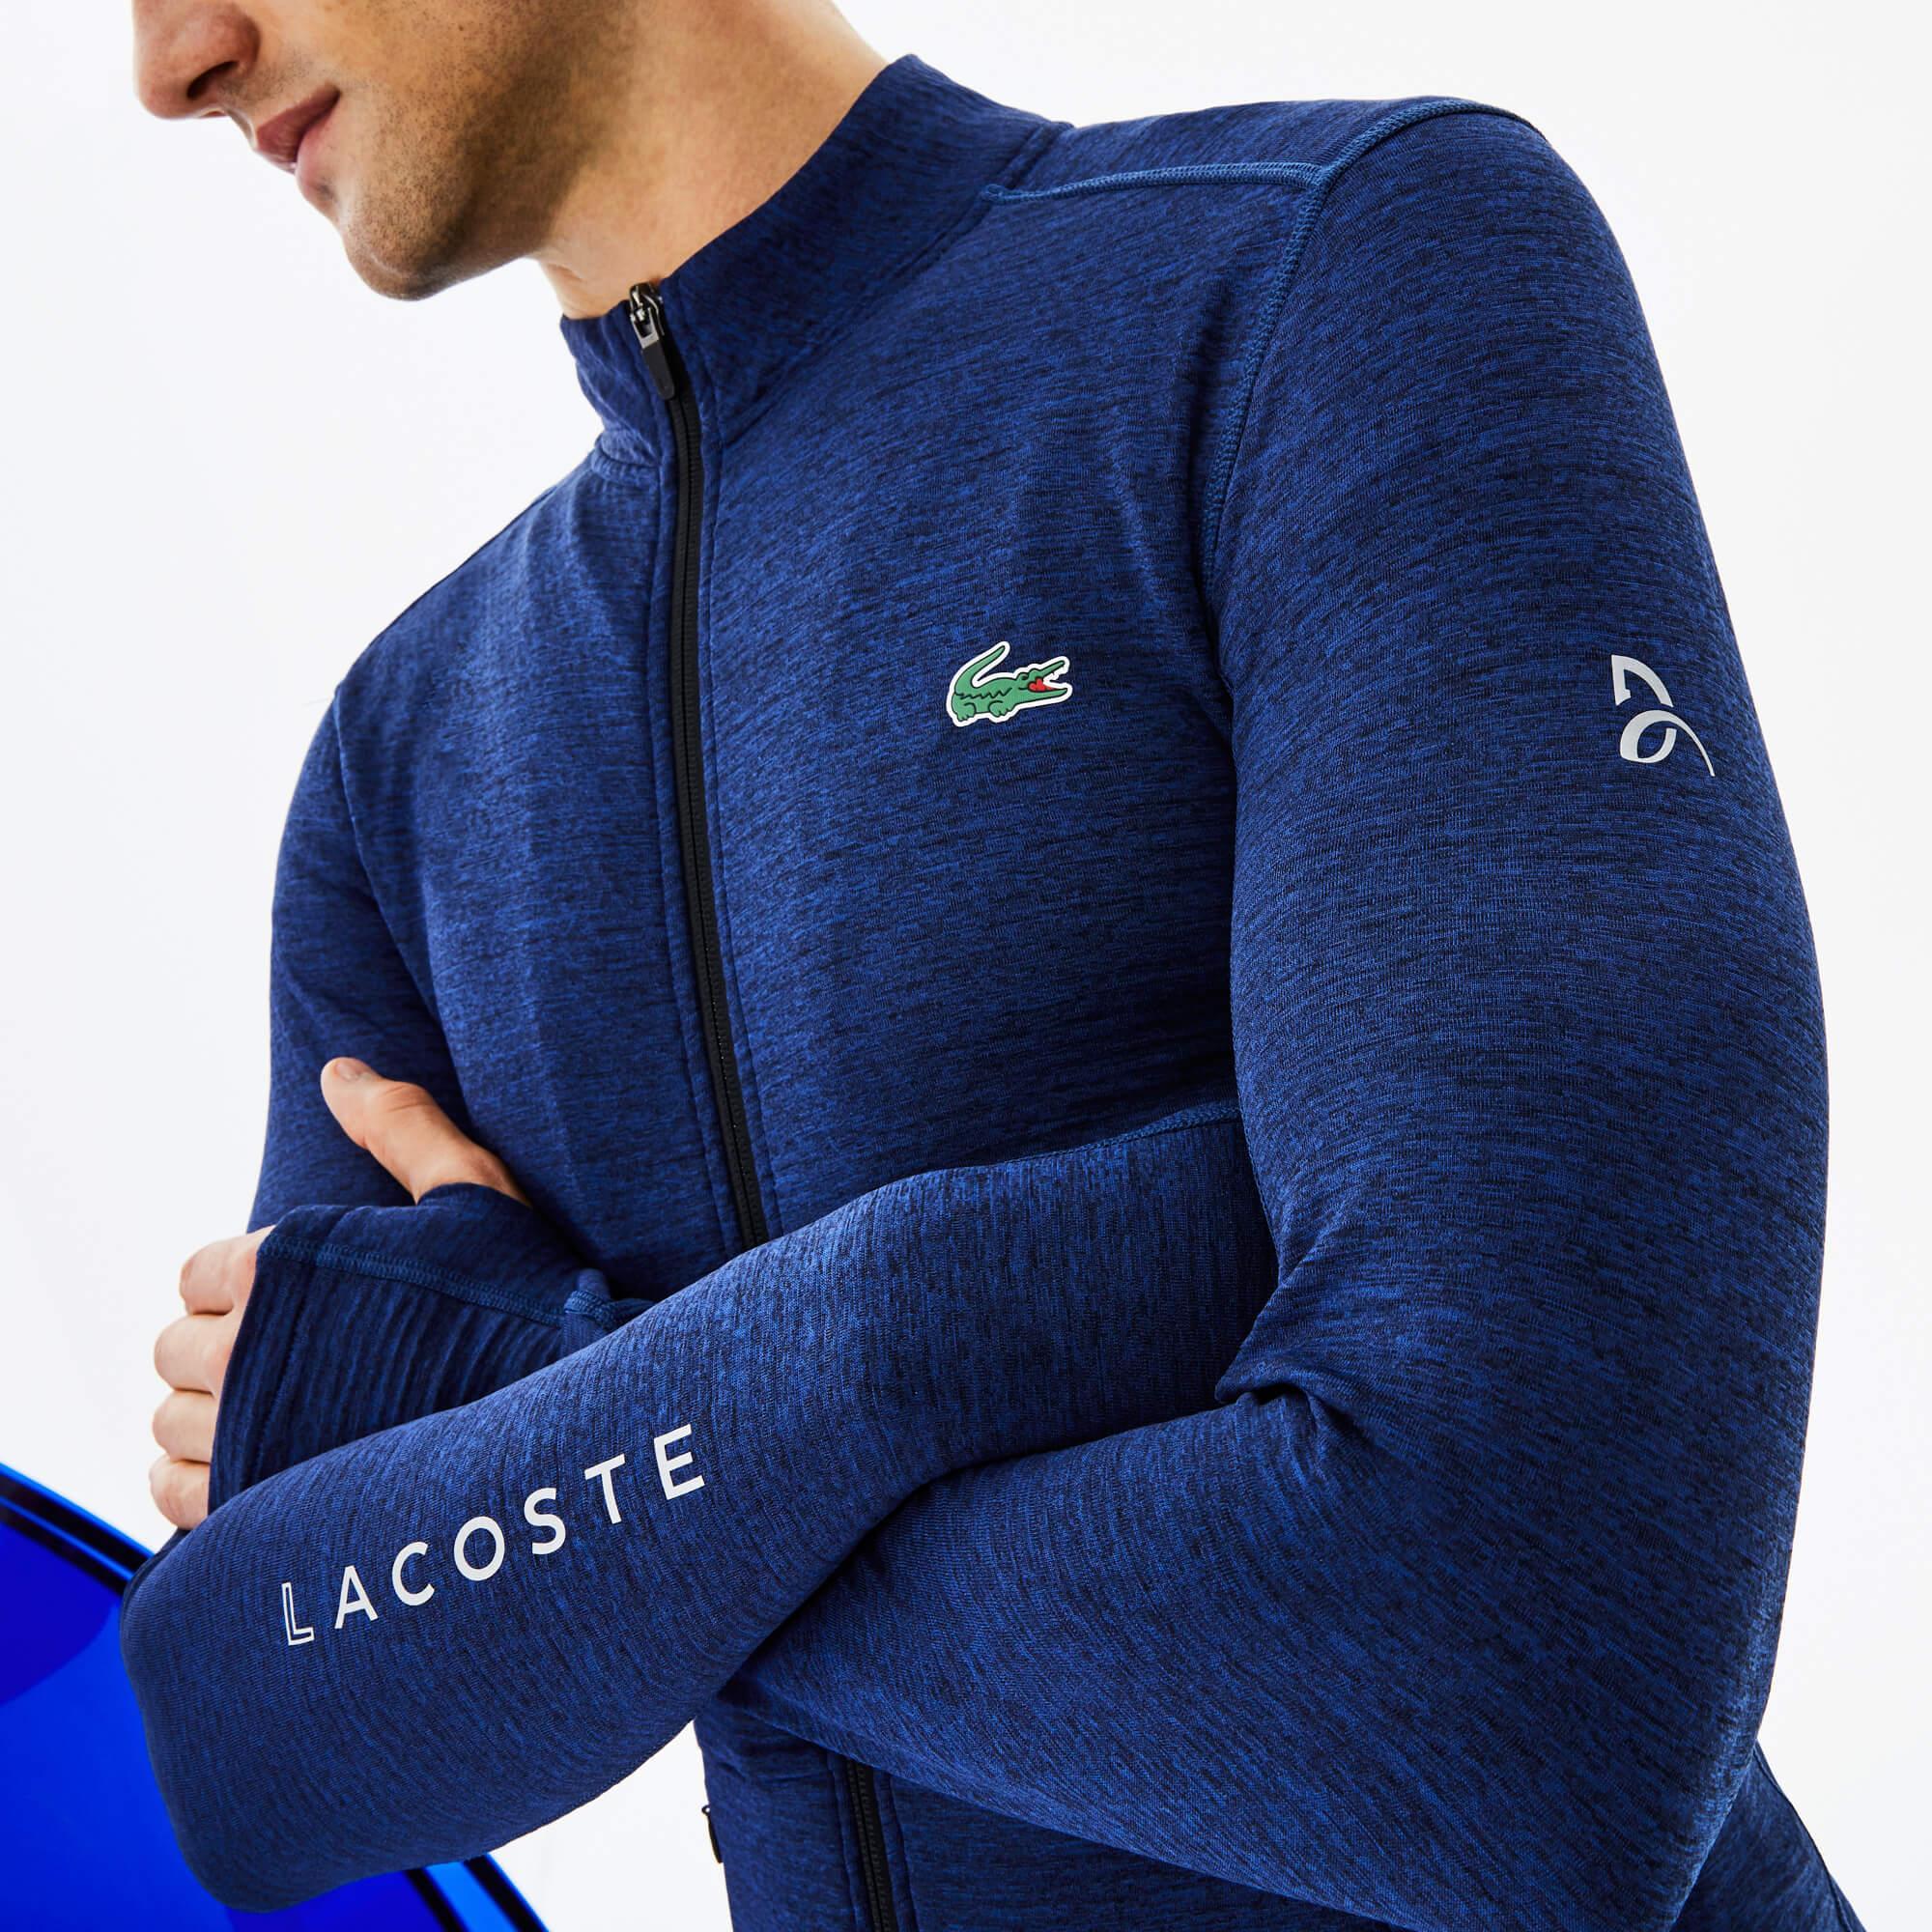 Lacoste Sport Erkek Koyu Mavi Sweatshirt